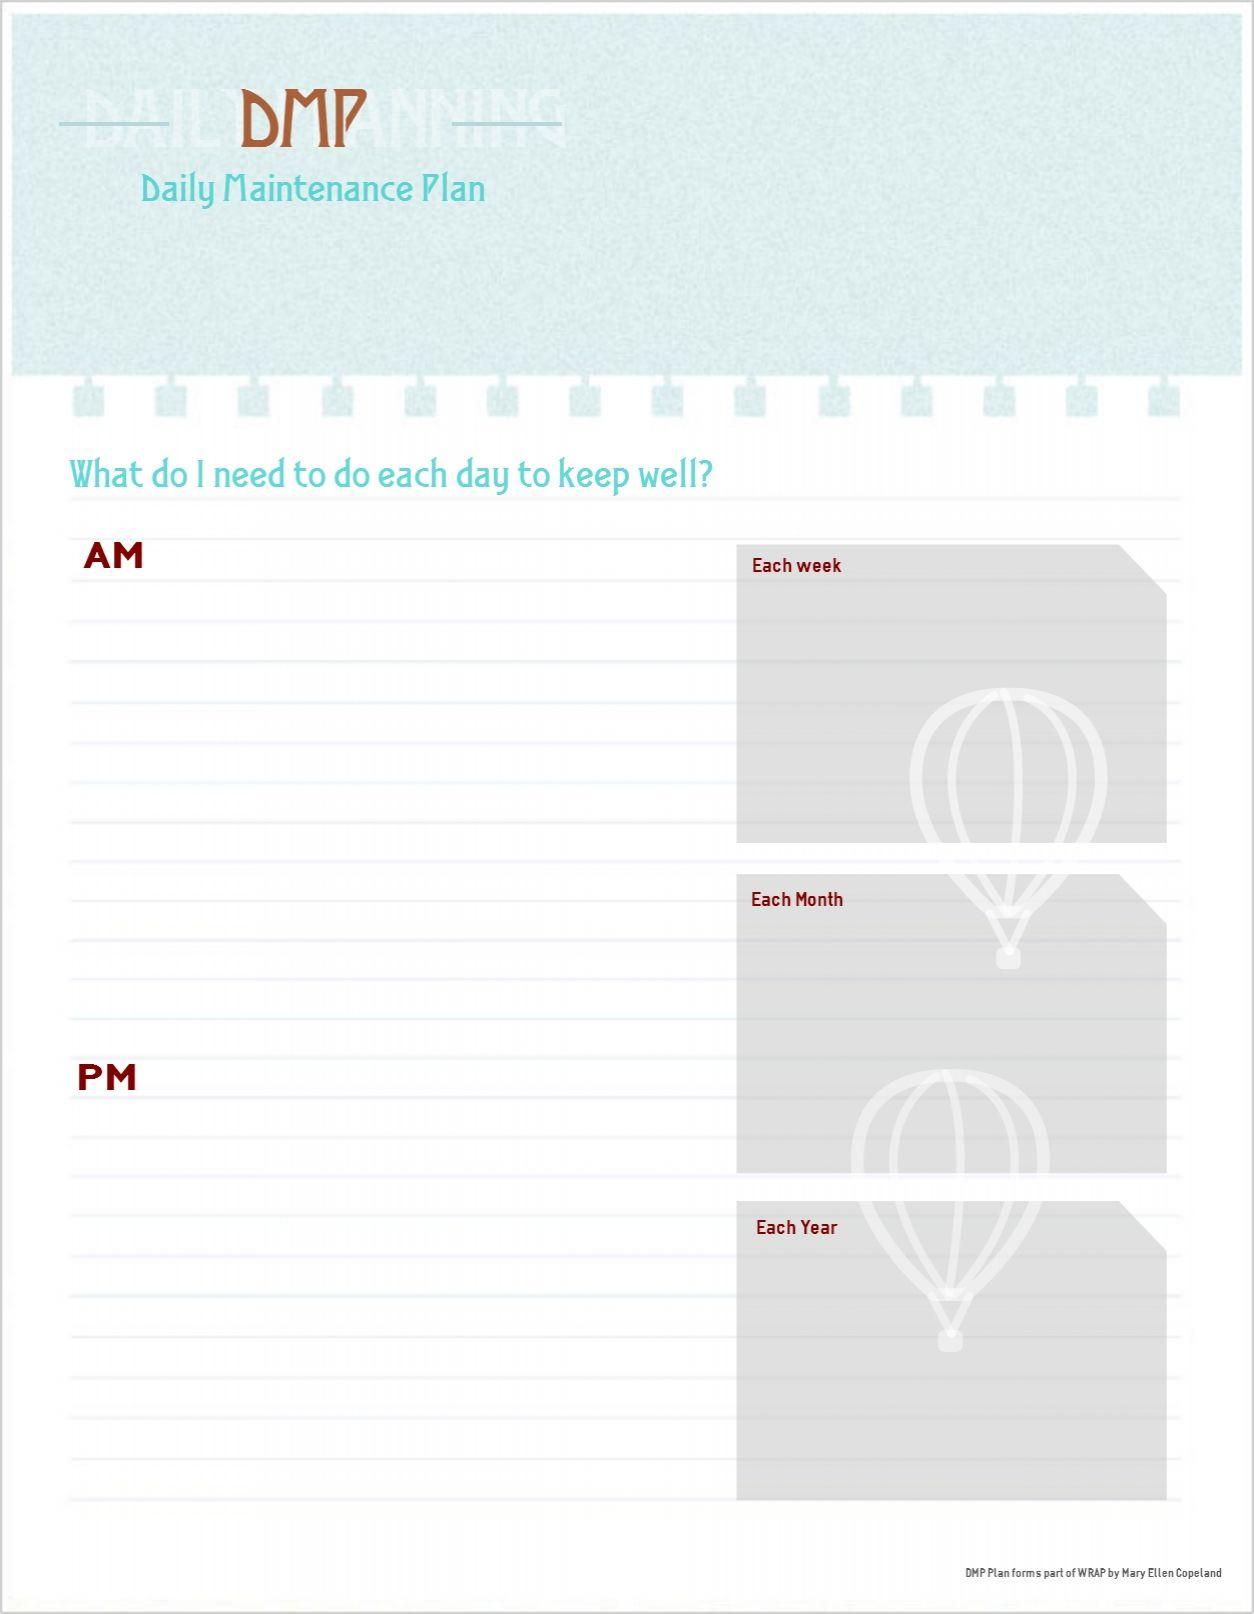 Daily Maintenance Plan Template Free Printable